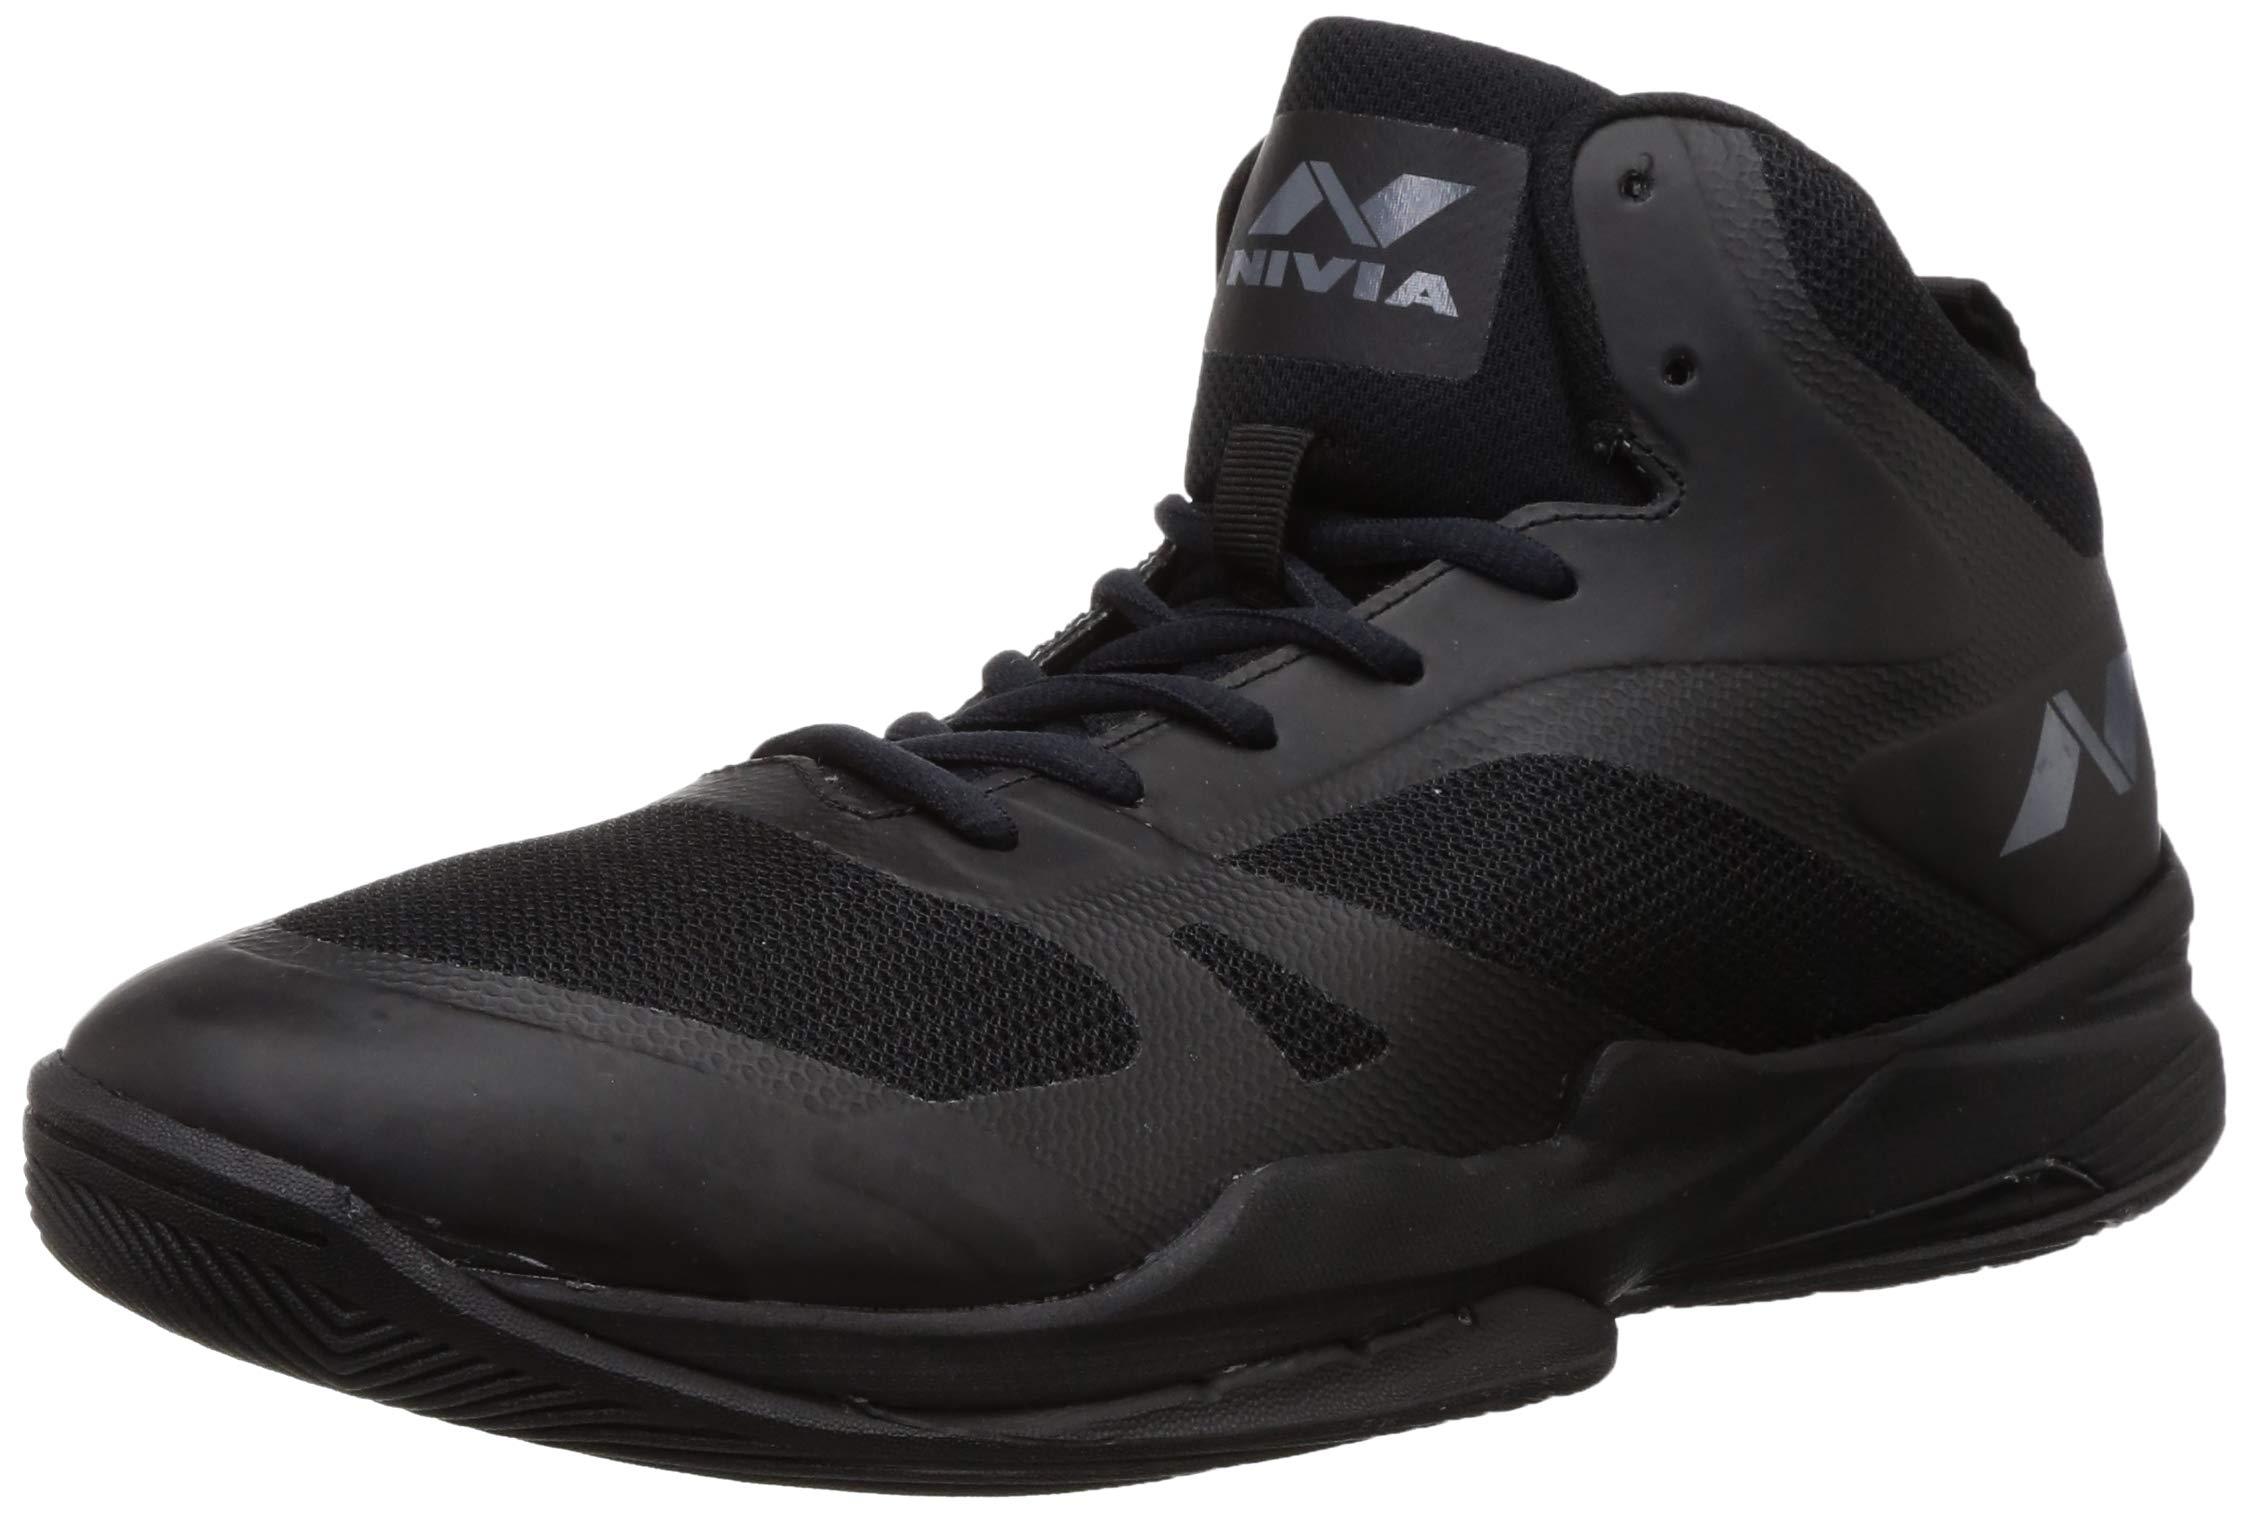 Nivia Combat 2.0 Basketball Shoes for Men (12) (B07VRX9Y58) Amazon Price History, Amazon Price Tracker